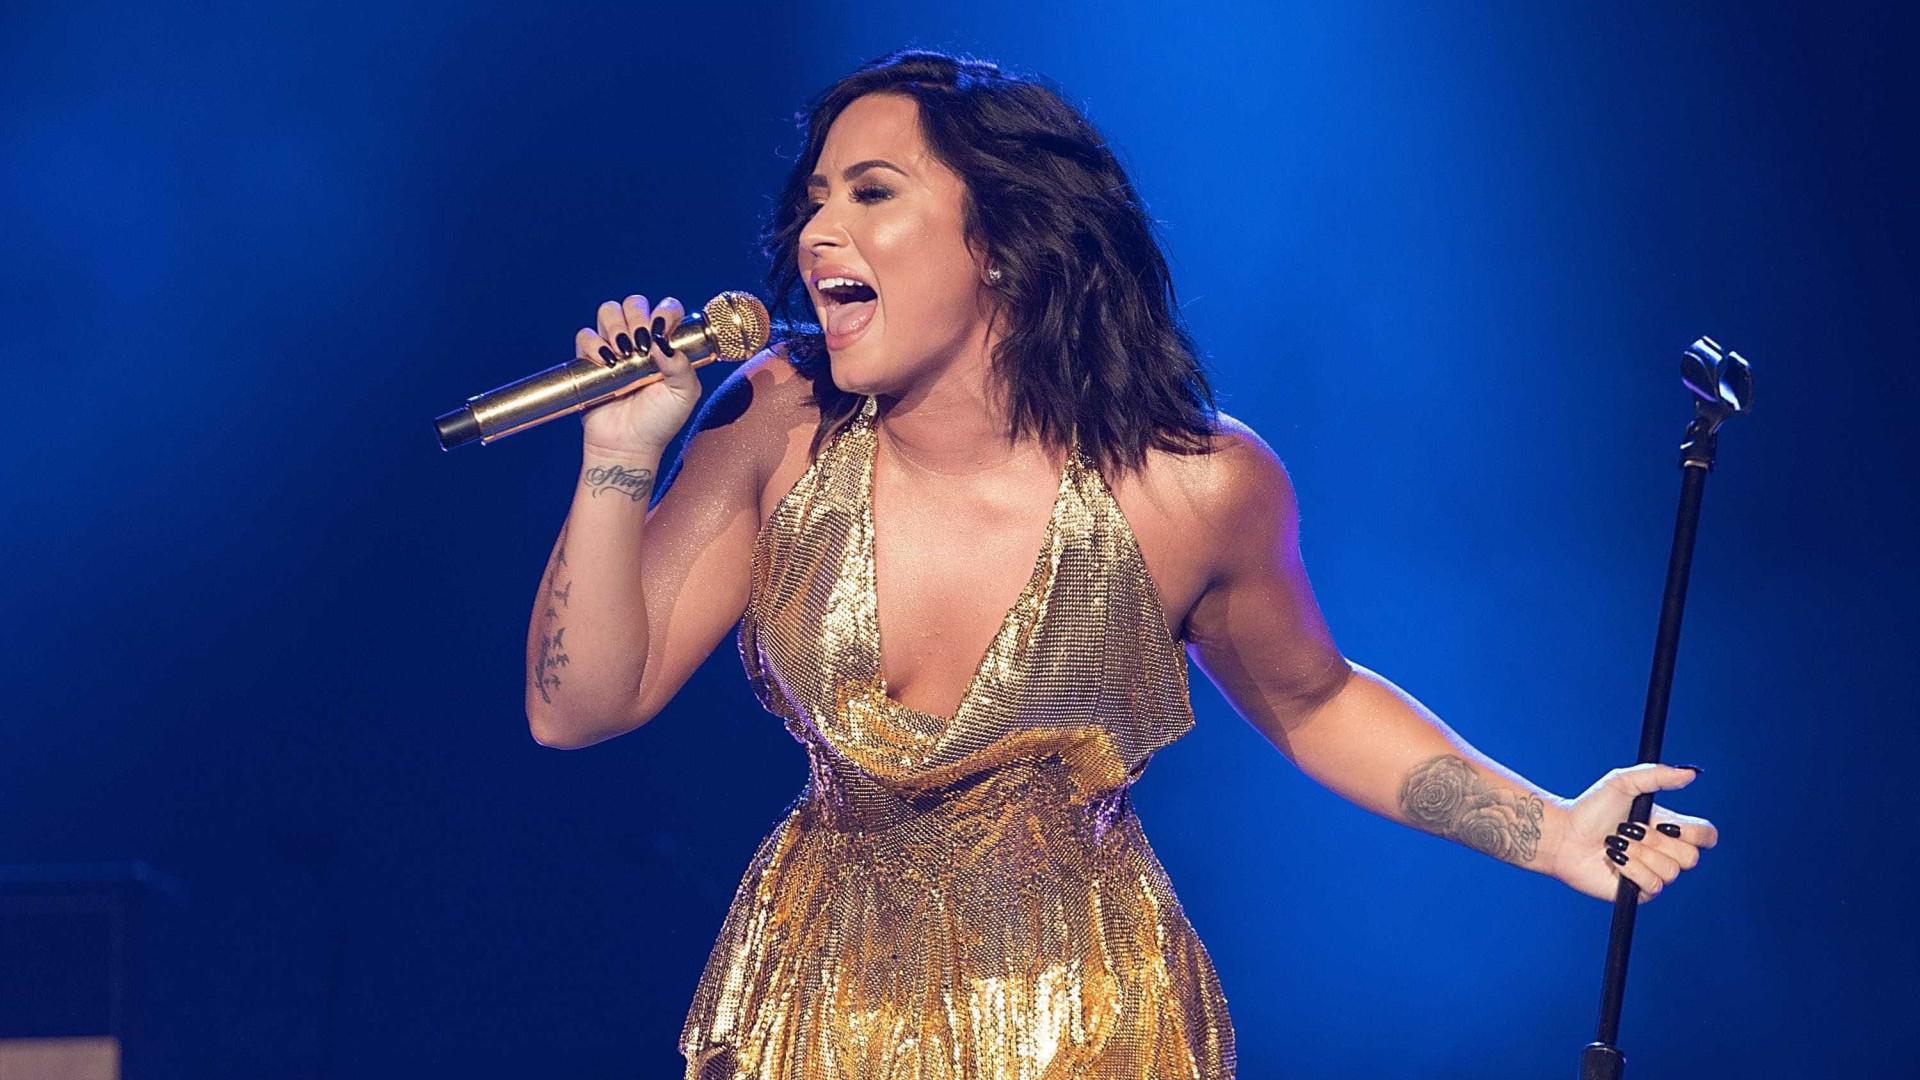 Demi Lovato confirma data de novo single em teaser misterioso